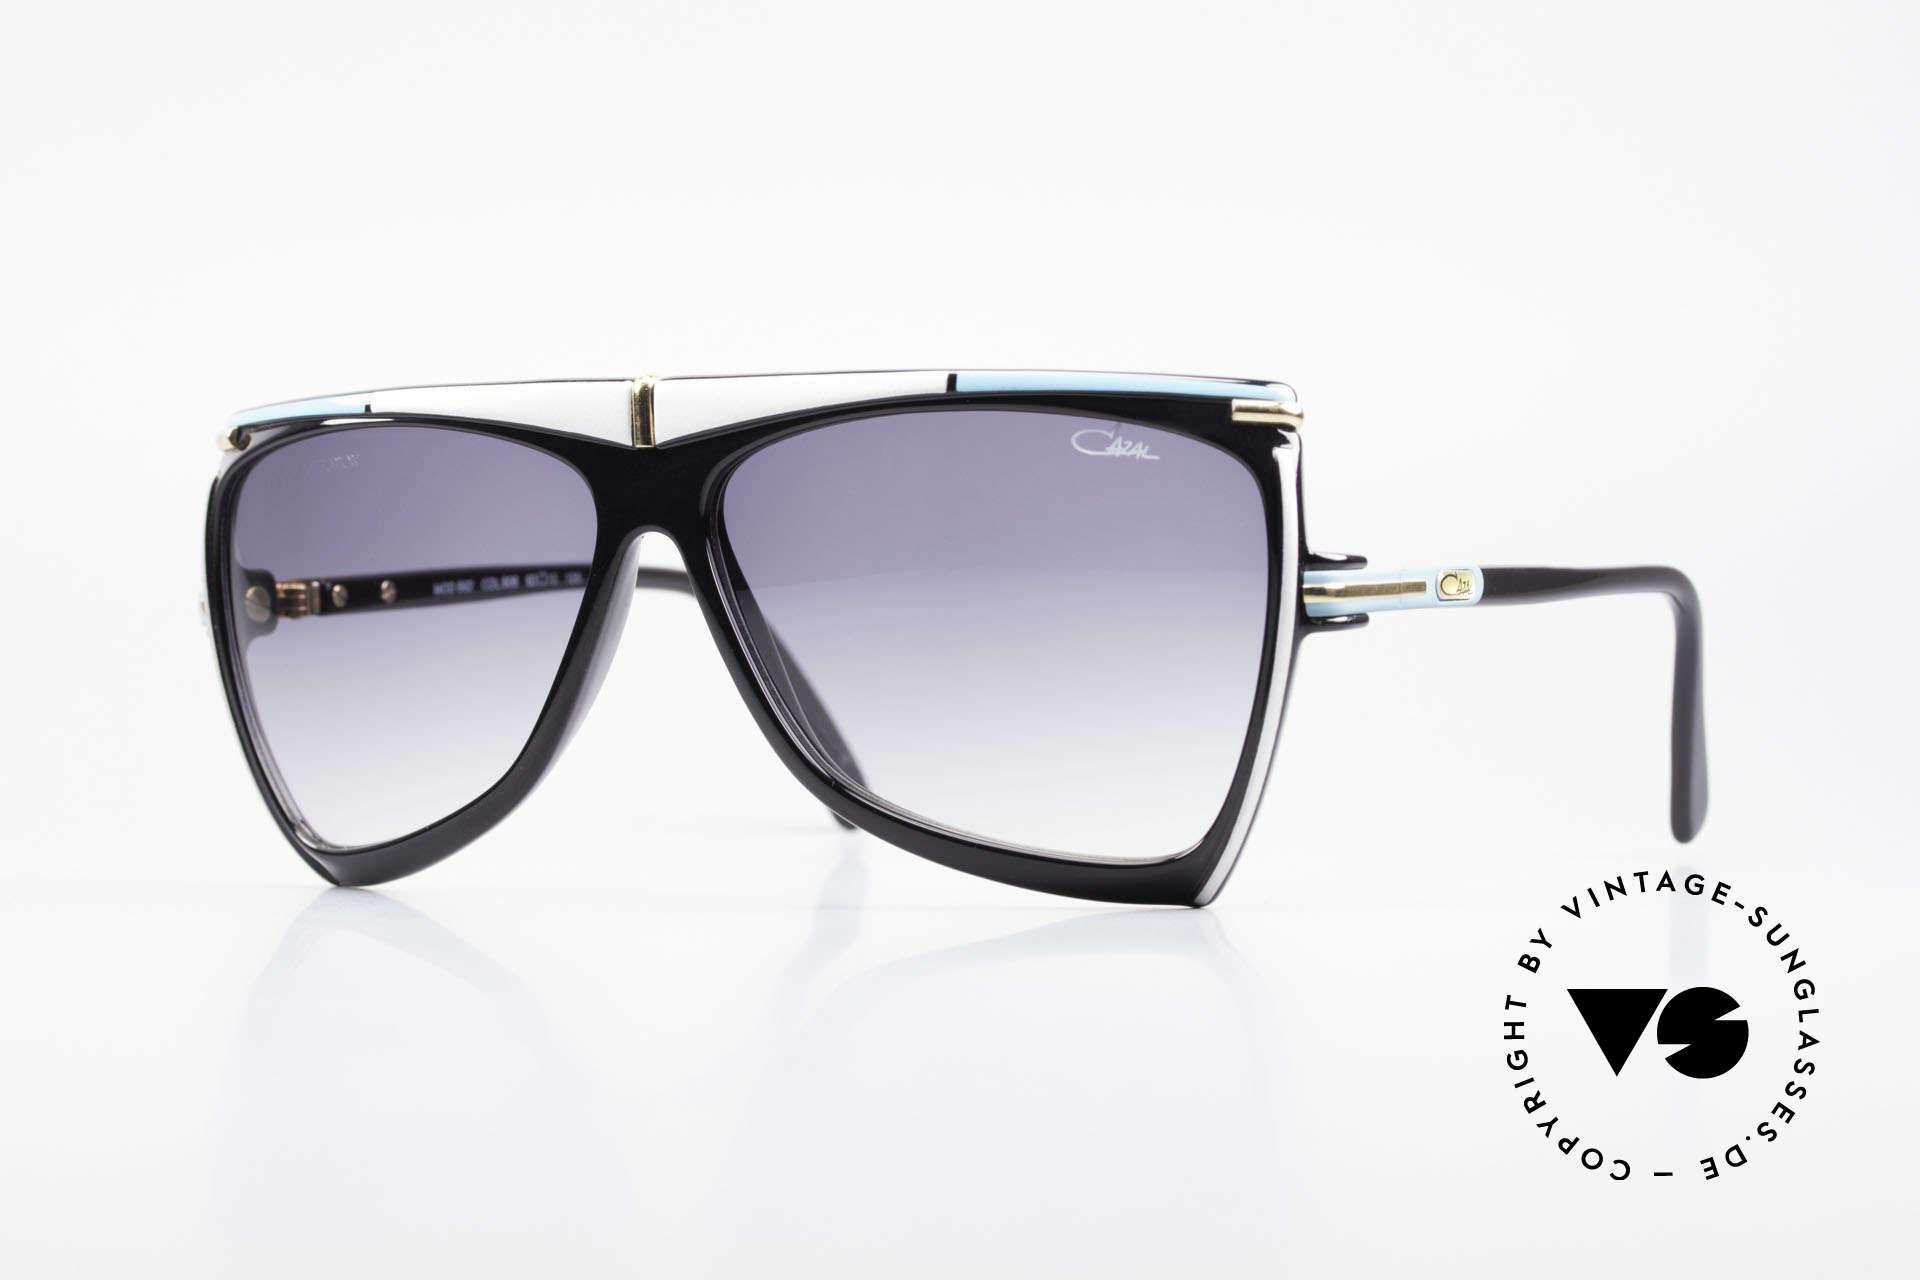 Cazal 862 West Germany Original Cazal, rare & fancy Cazal 80's designer sunglasses, Made for Men and Women